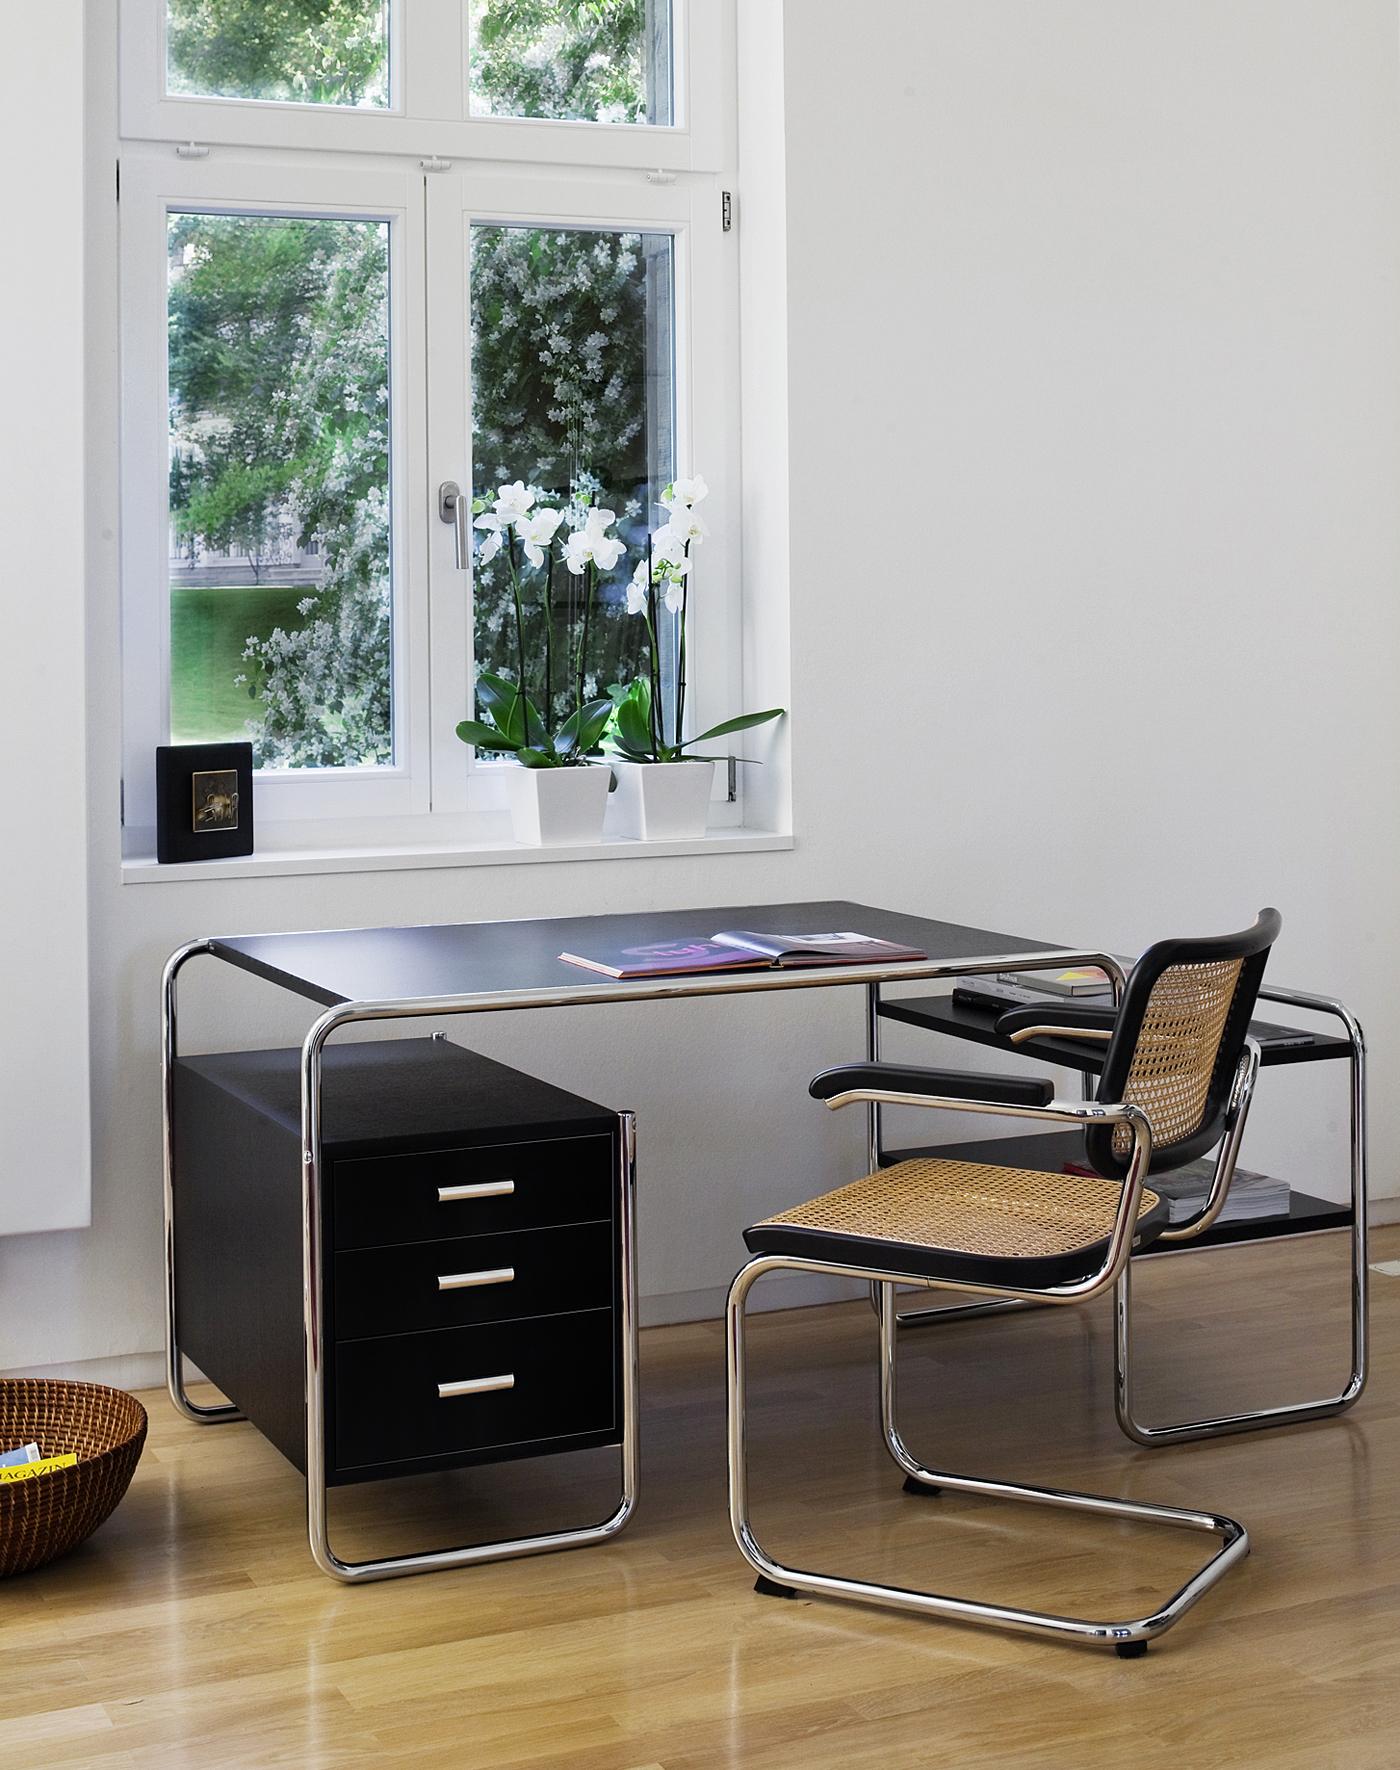 thonet stuhl s 32 freischwinger mit rohrgeflecht designikonen designm bel shop. Black Bedroom Furniture Sets. Home Design Ideas